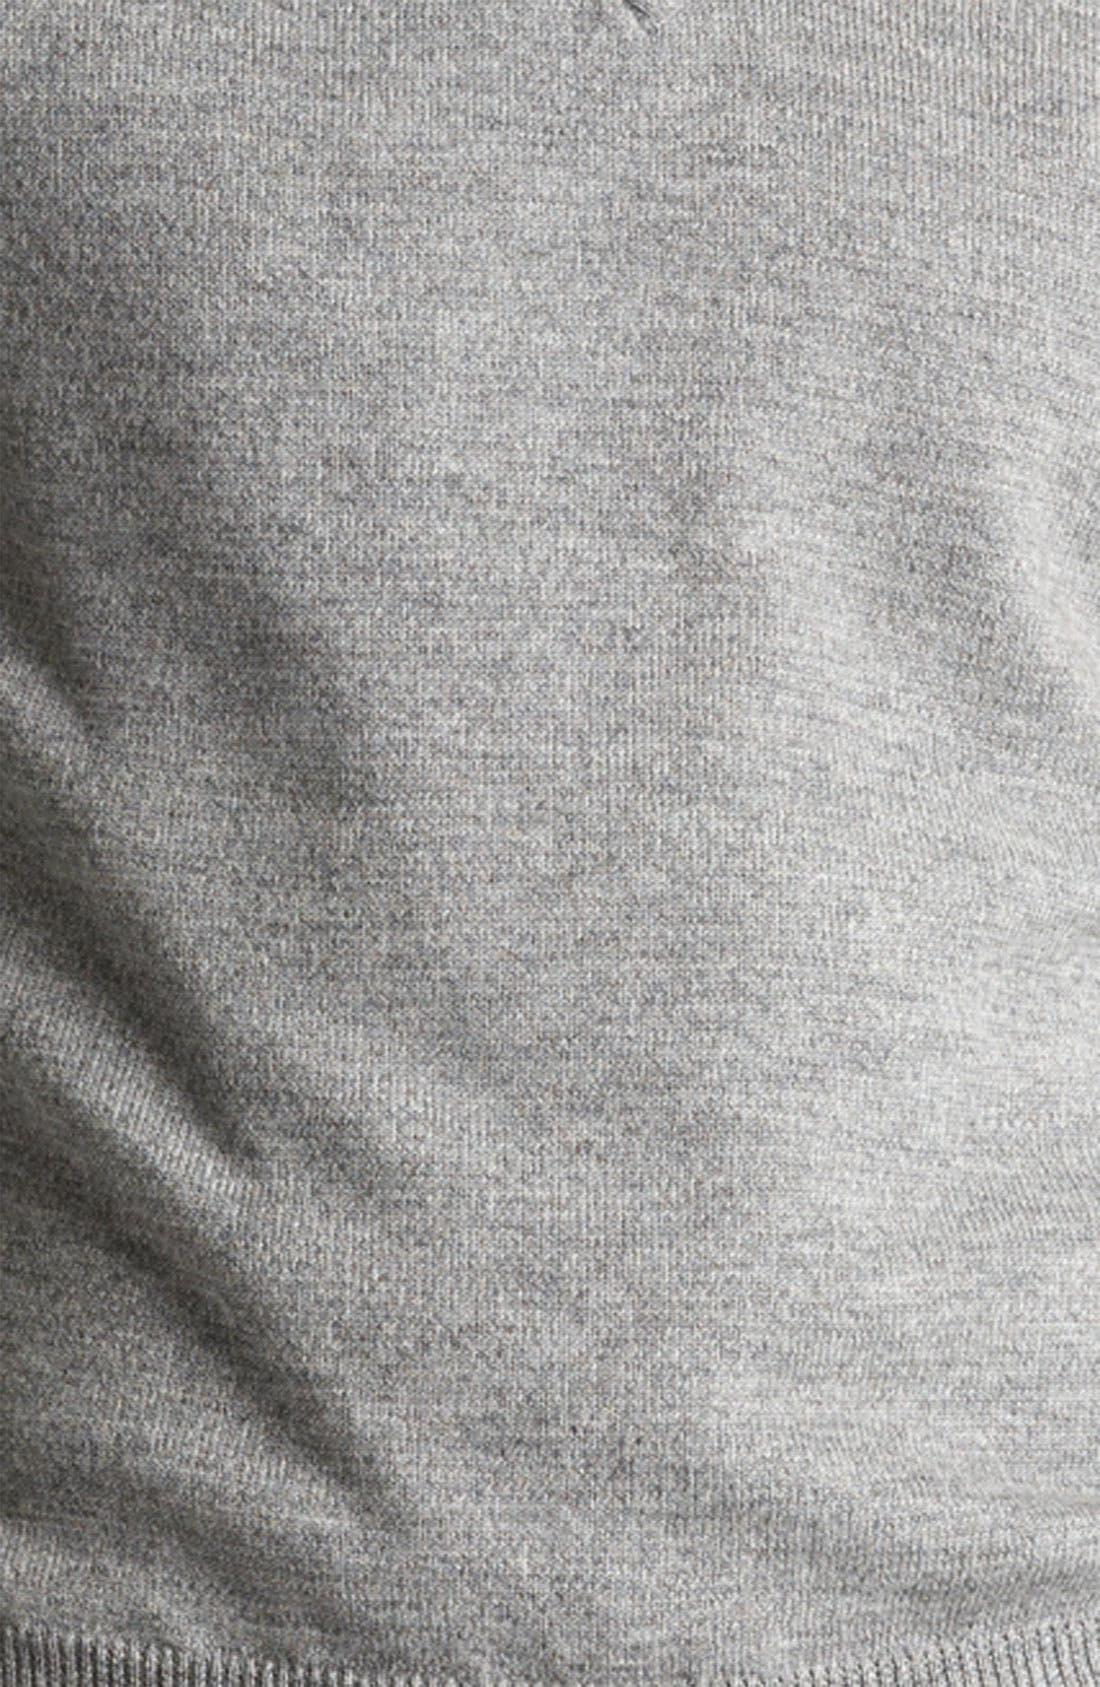 Alternate Image 3  - Todd Snyder V-Neck Merino Wool Sweater